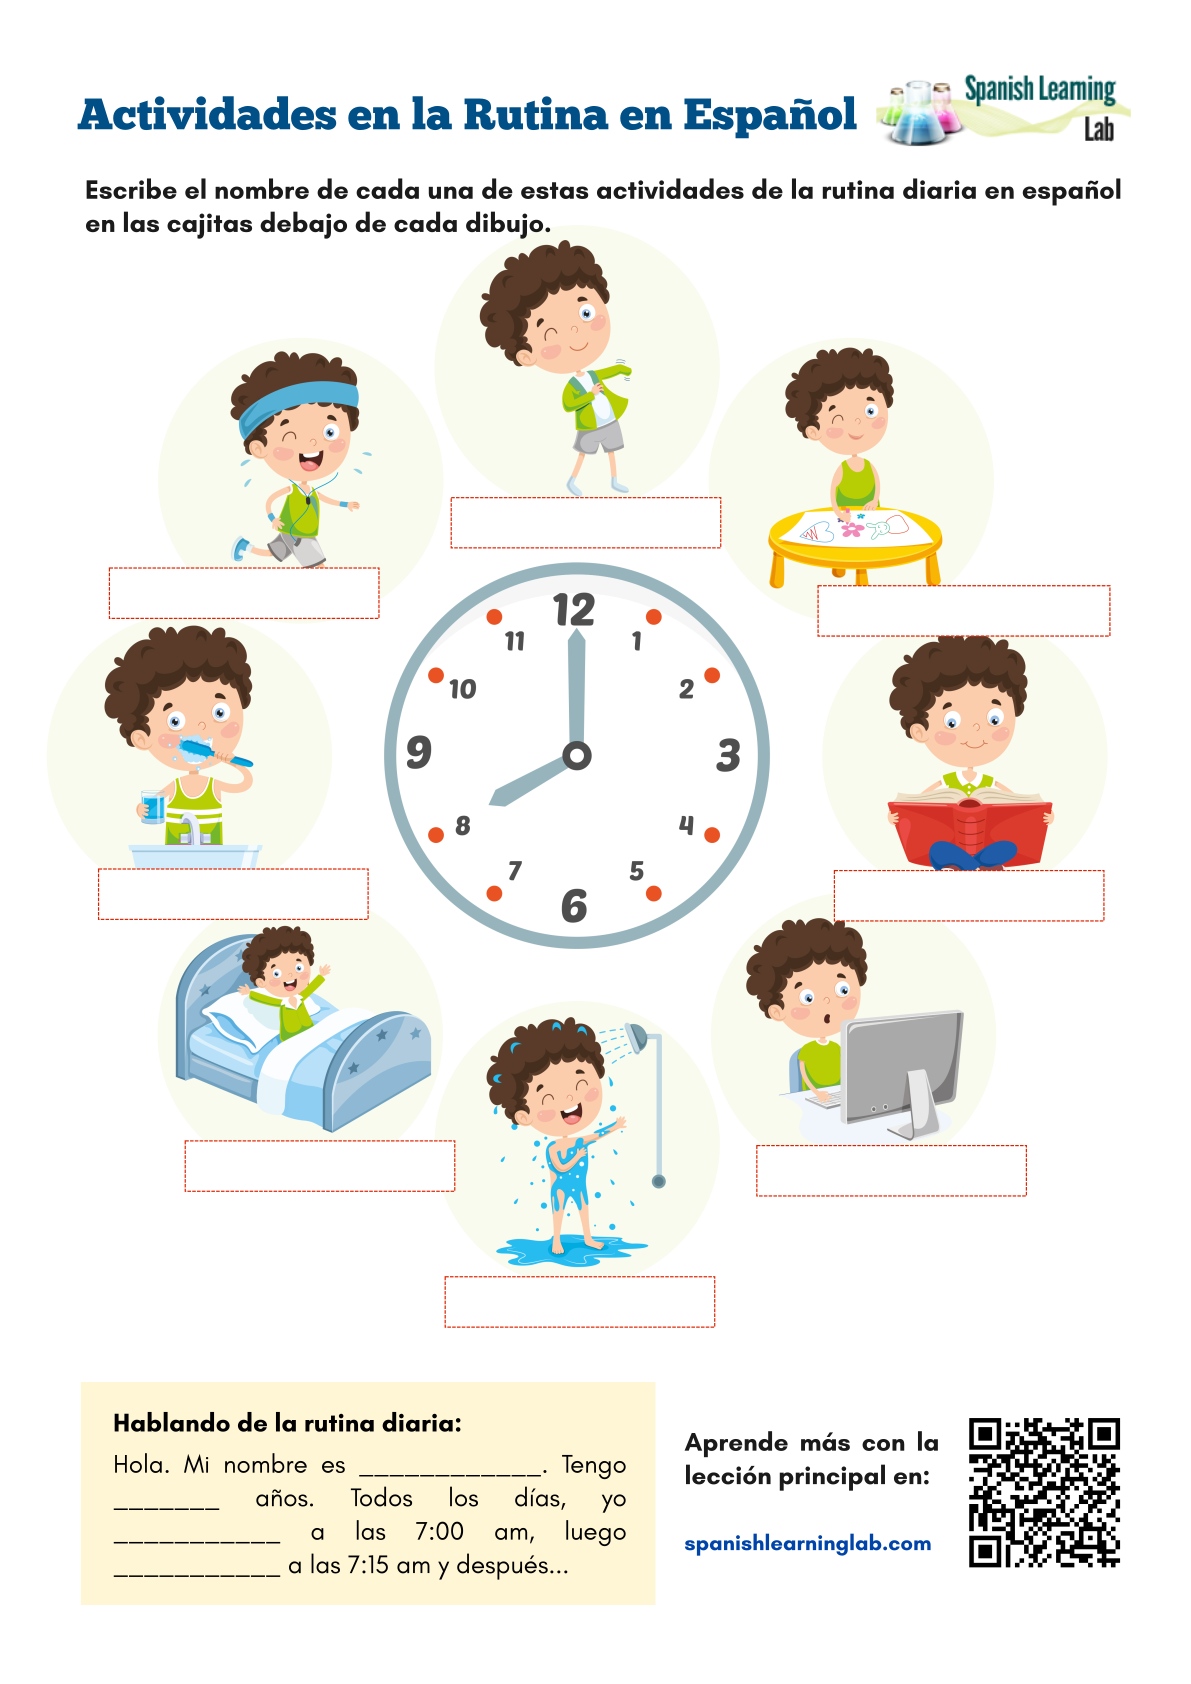 Daily Activities in Spanish - PDF Worksheet - SpanishLearningLab